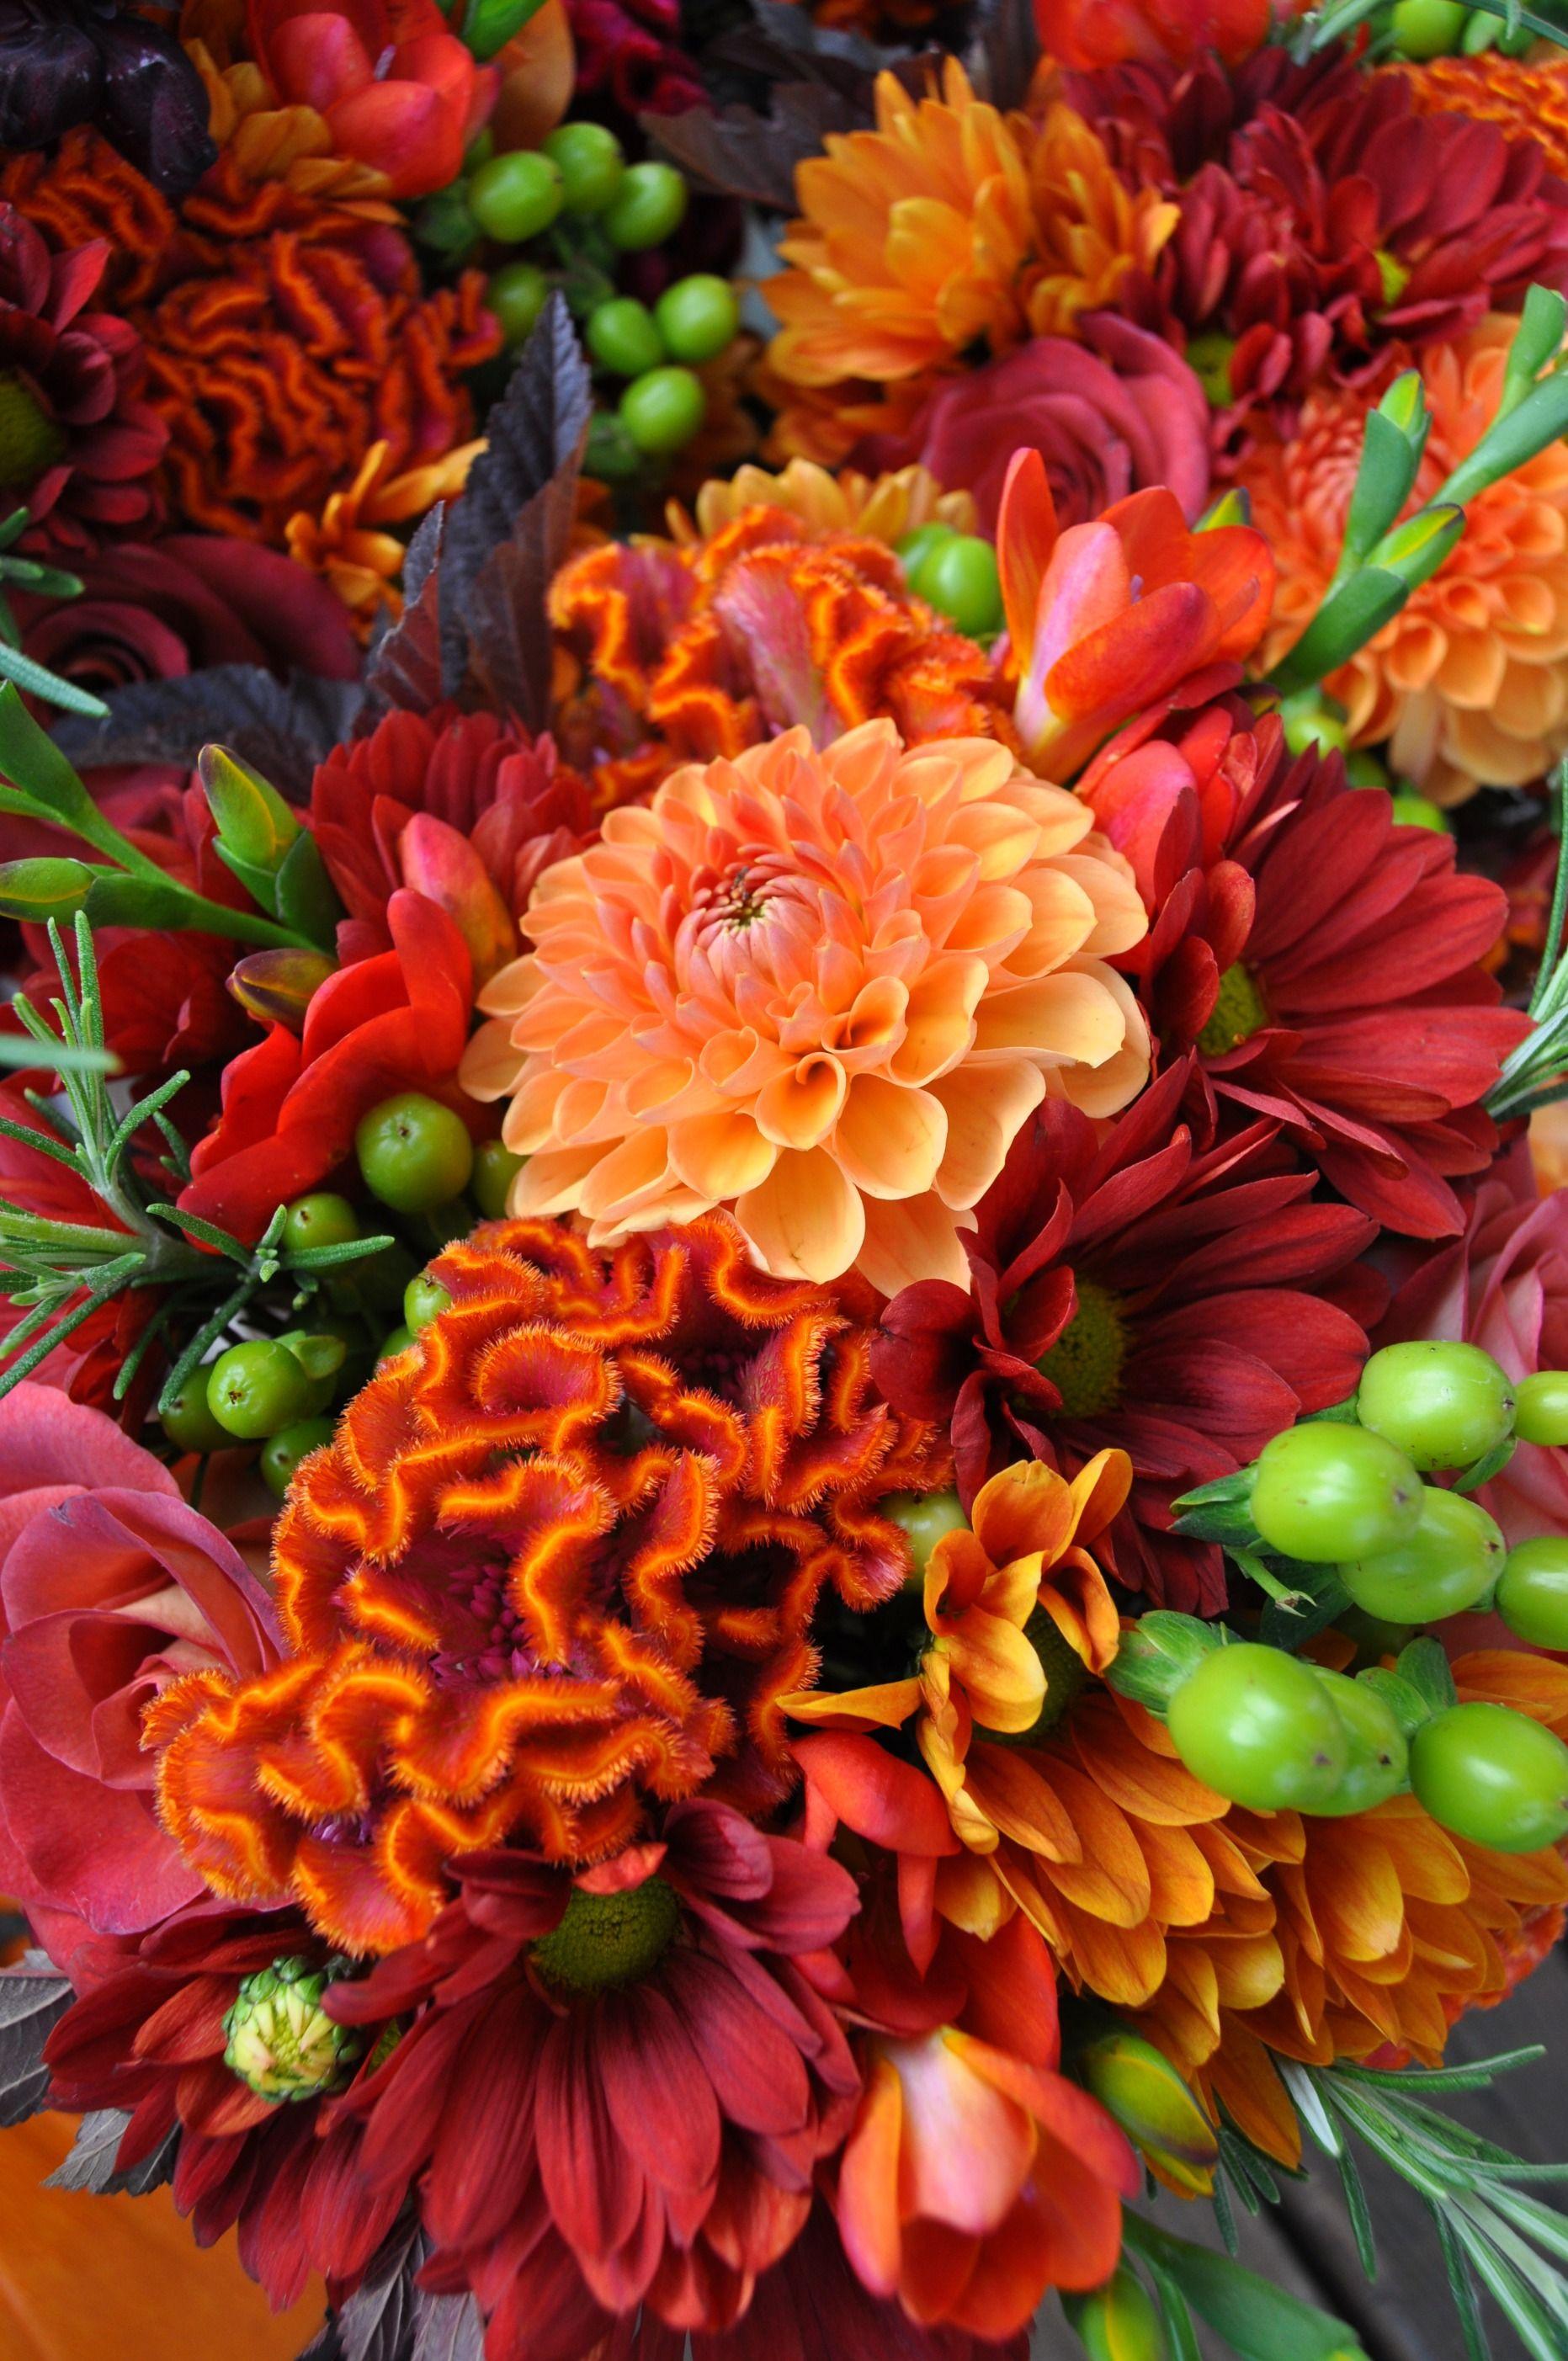 Country Bouquets Wedding Flower Arrangements Fall Fall Flowers Fall Wedding Flowers